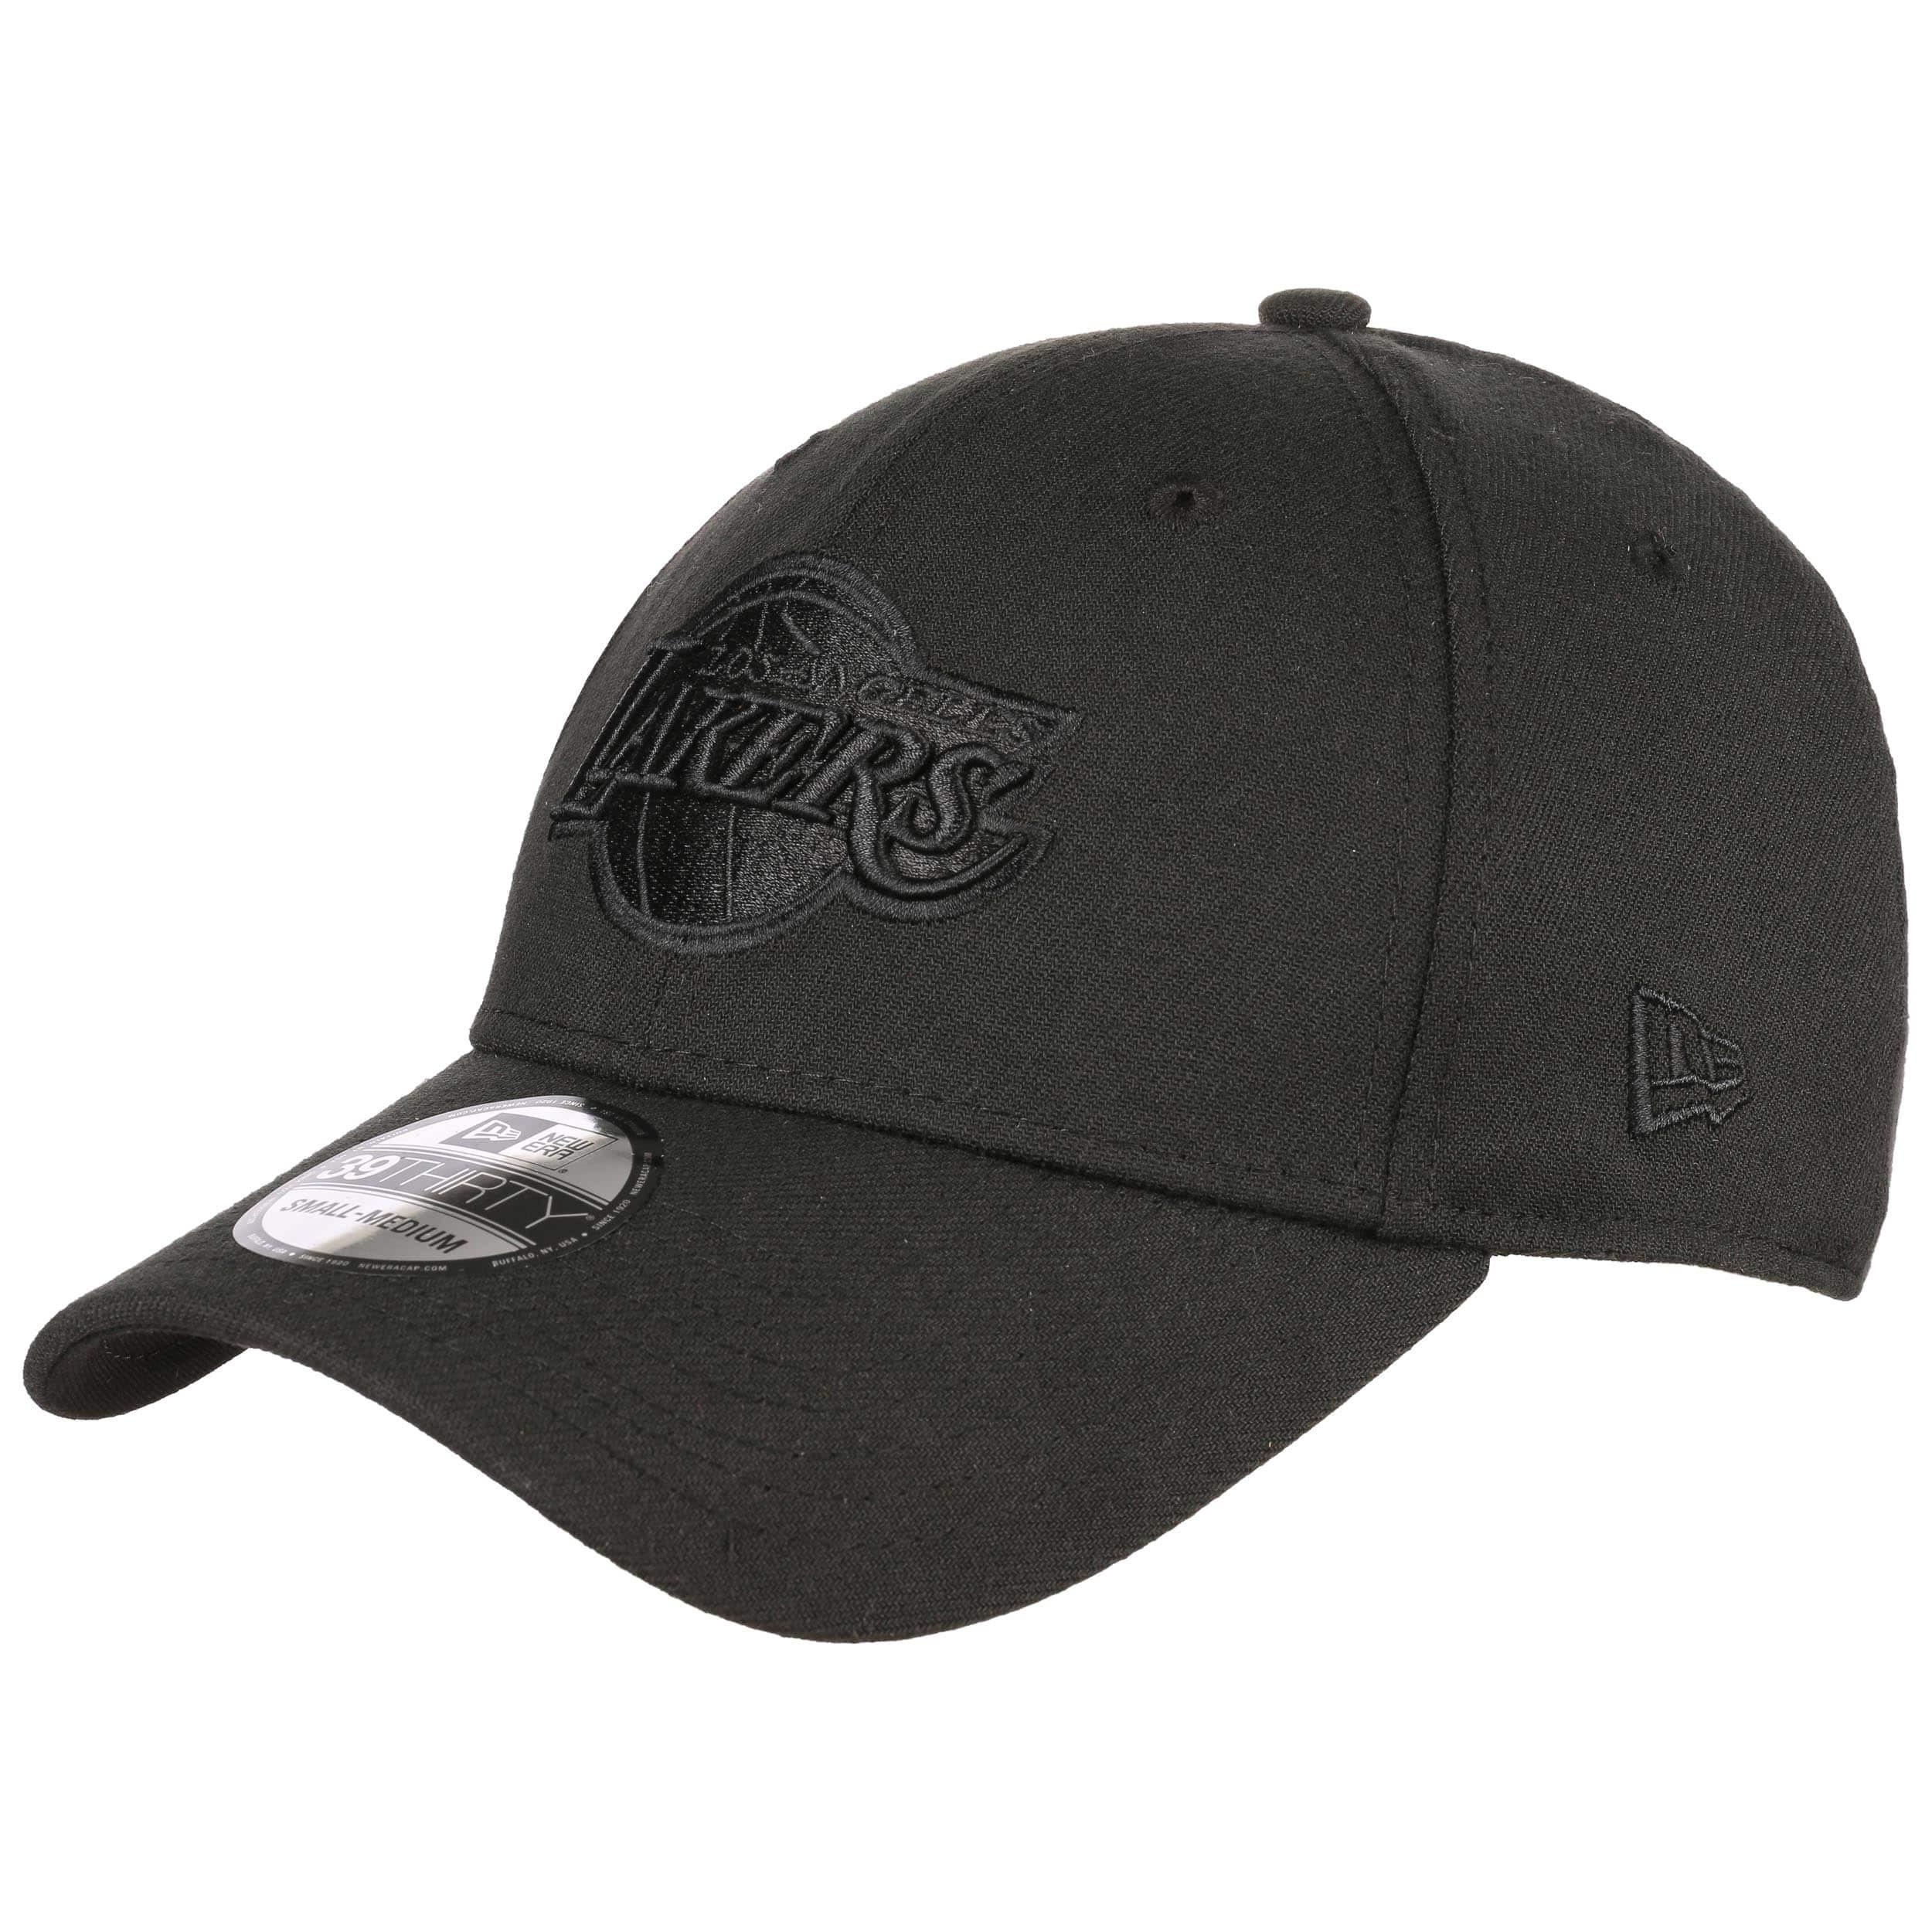 39thirty la lakers bob cap by new era eur 29 95 hats caps beanies shop online. Black Bedroom Furniture Sets. Home Design Ideas